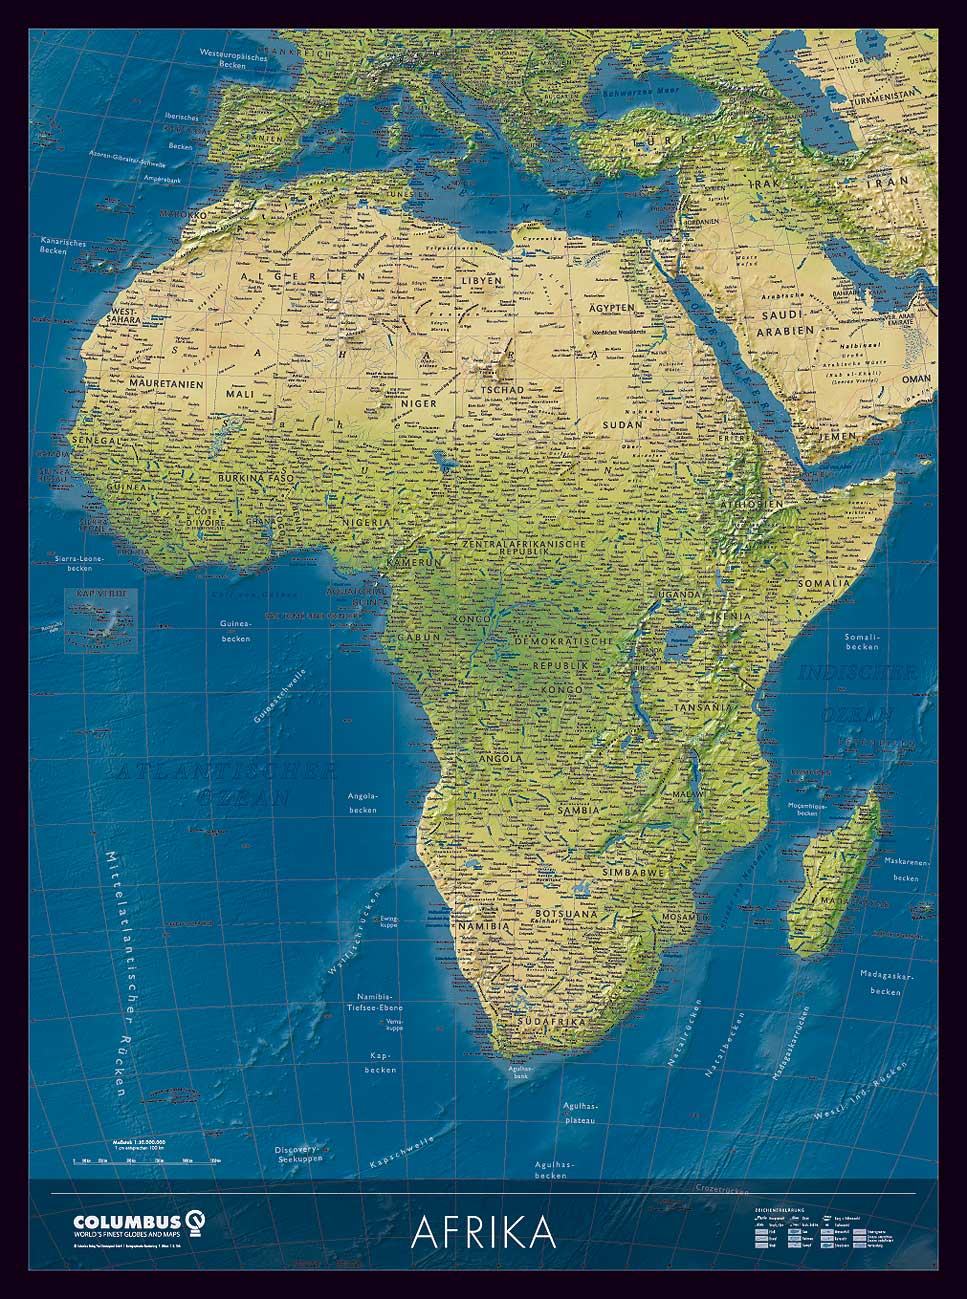 Afrika Karte Deutsch.Afrika Karte Oder Landkarte Afrika